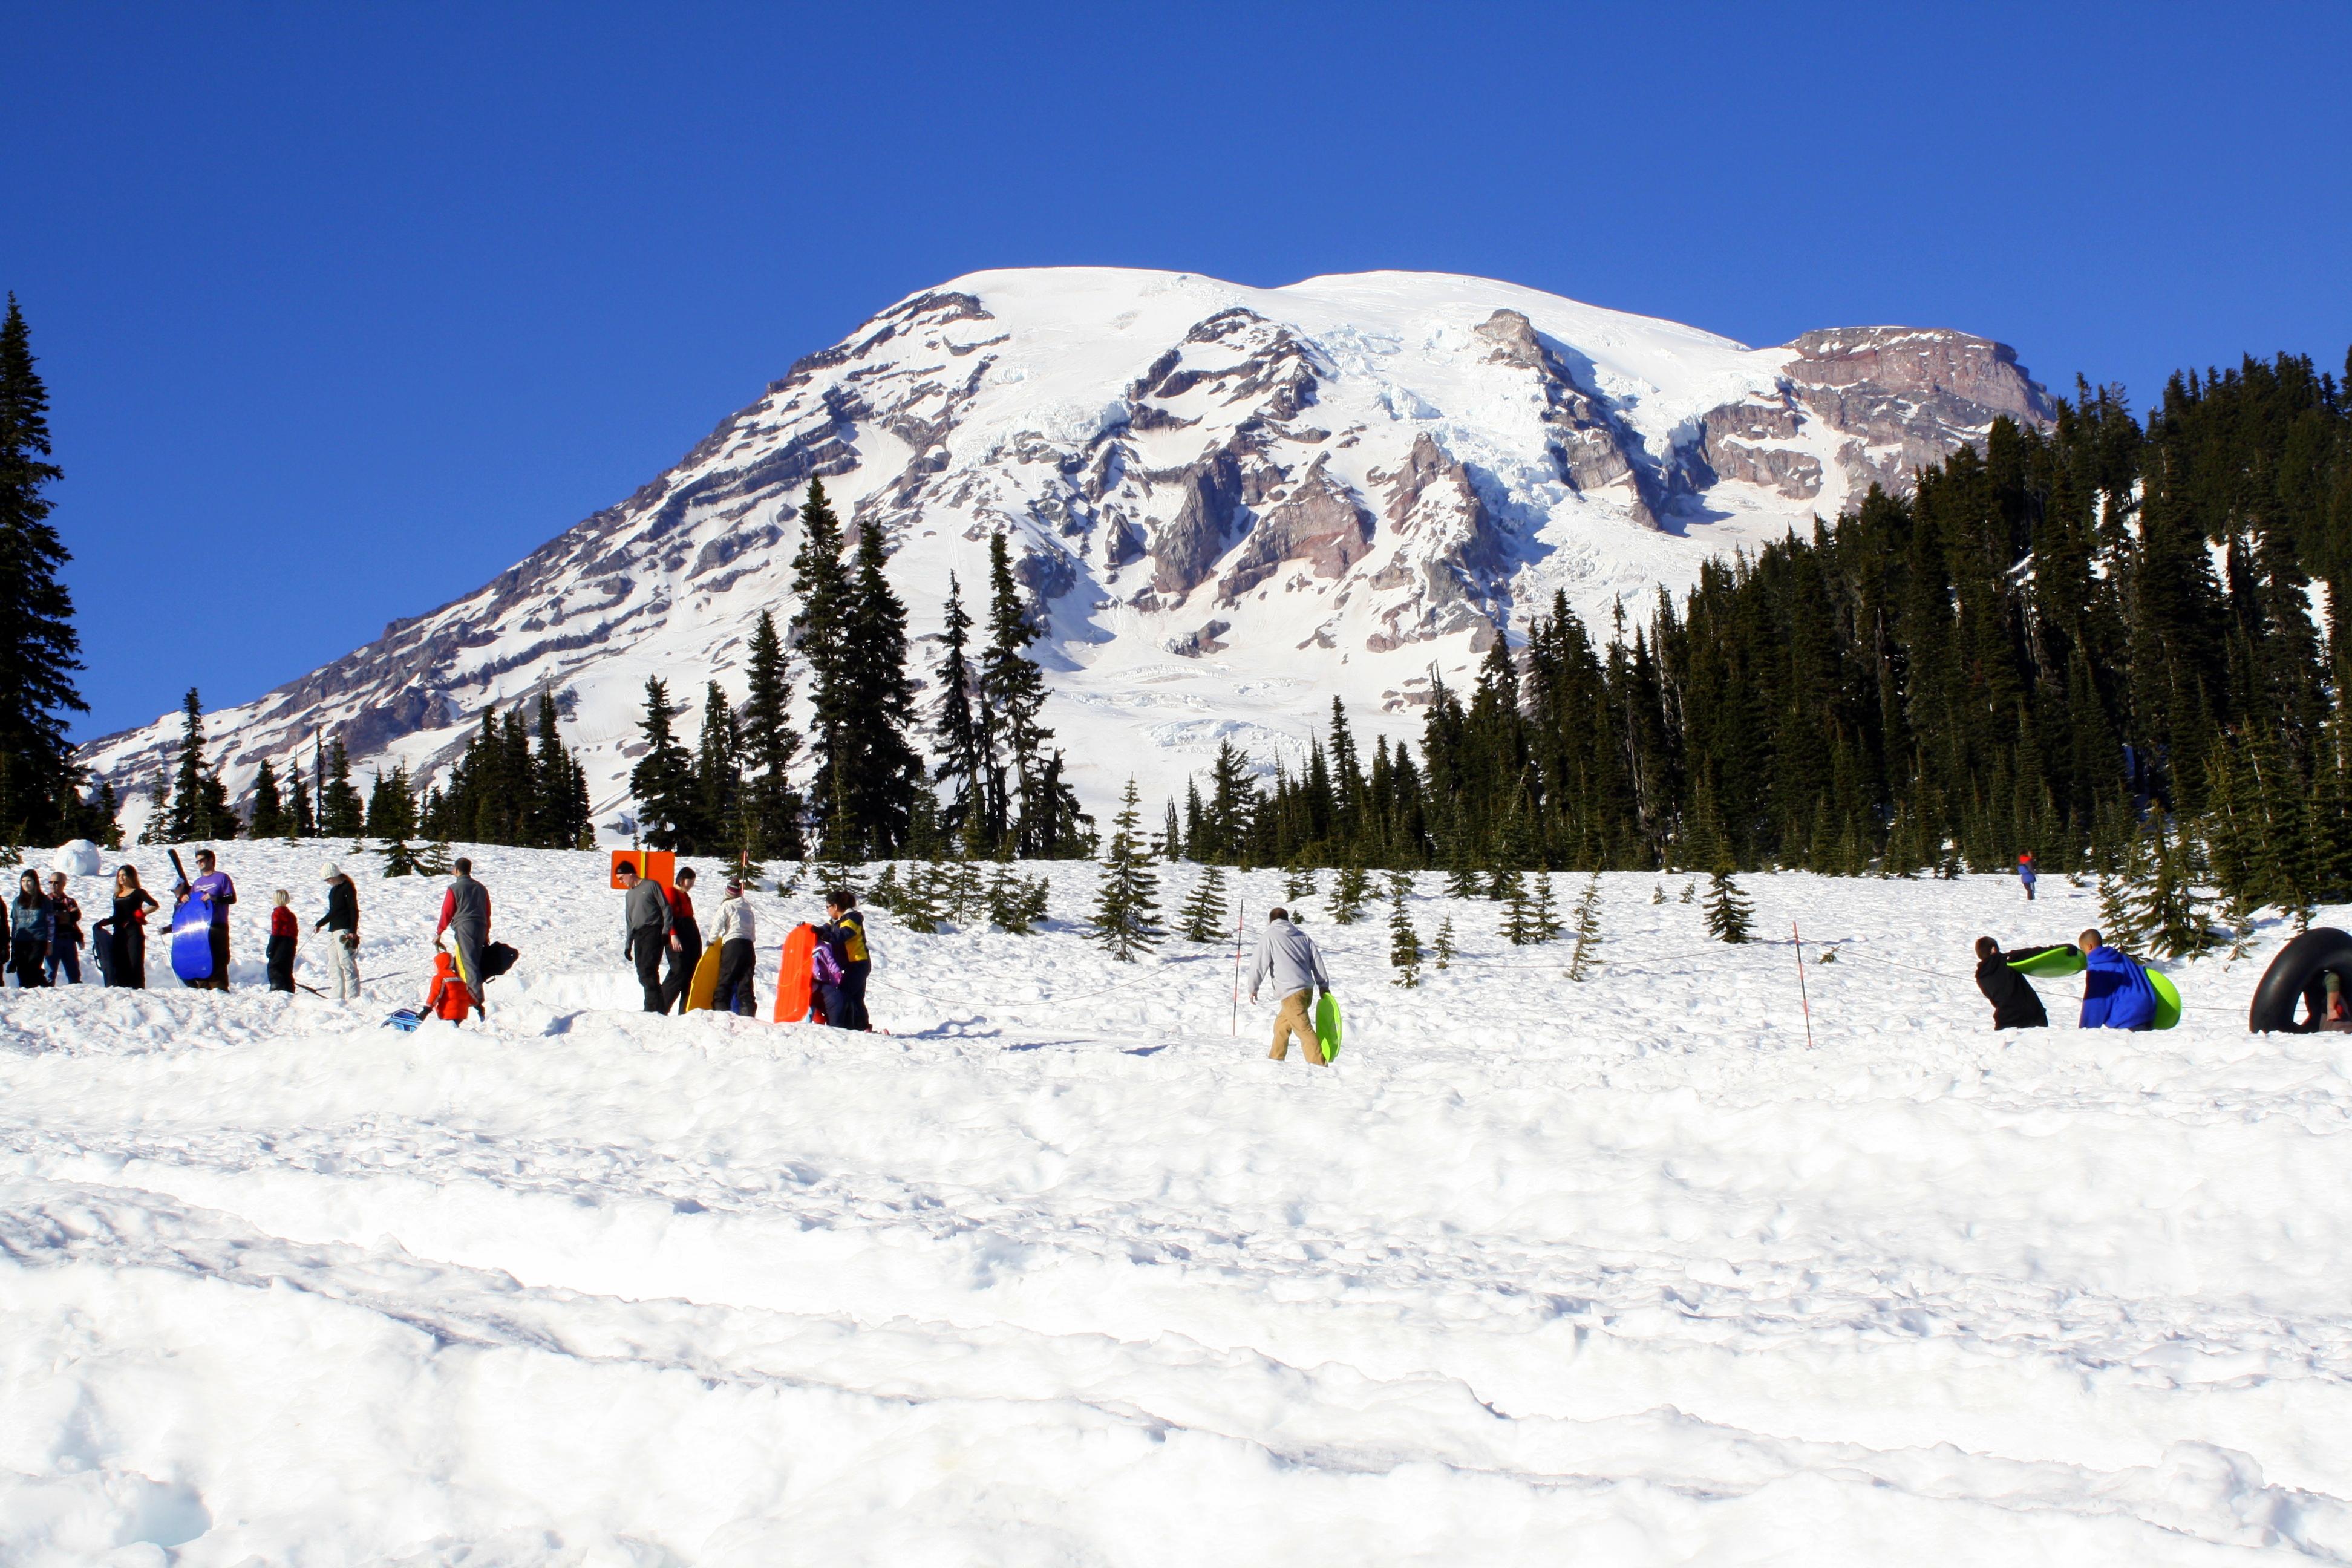 Winter snow picnic clipart graphic Sledding & Tubing at Snow Play Area Mt. Rainier | Visit Rainier graphic